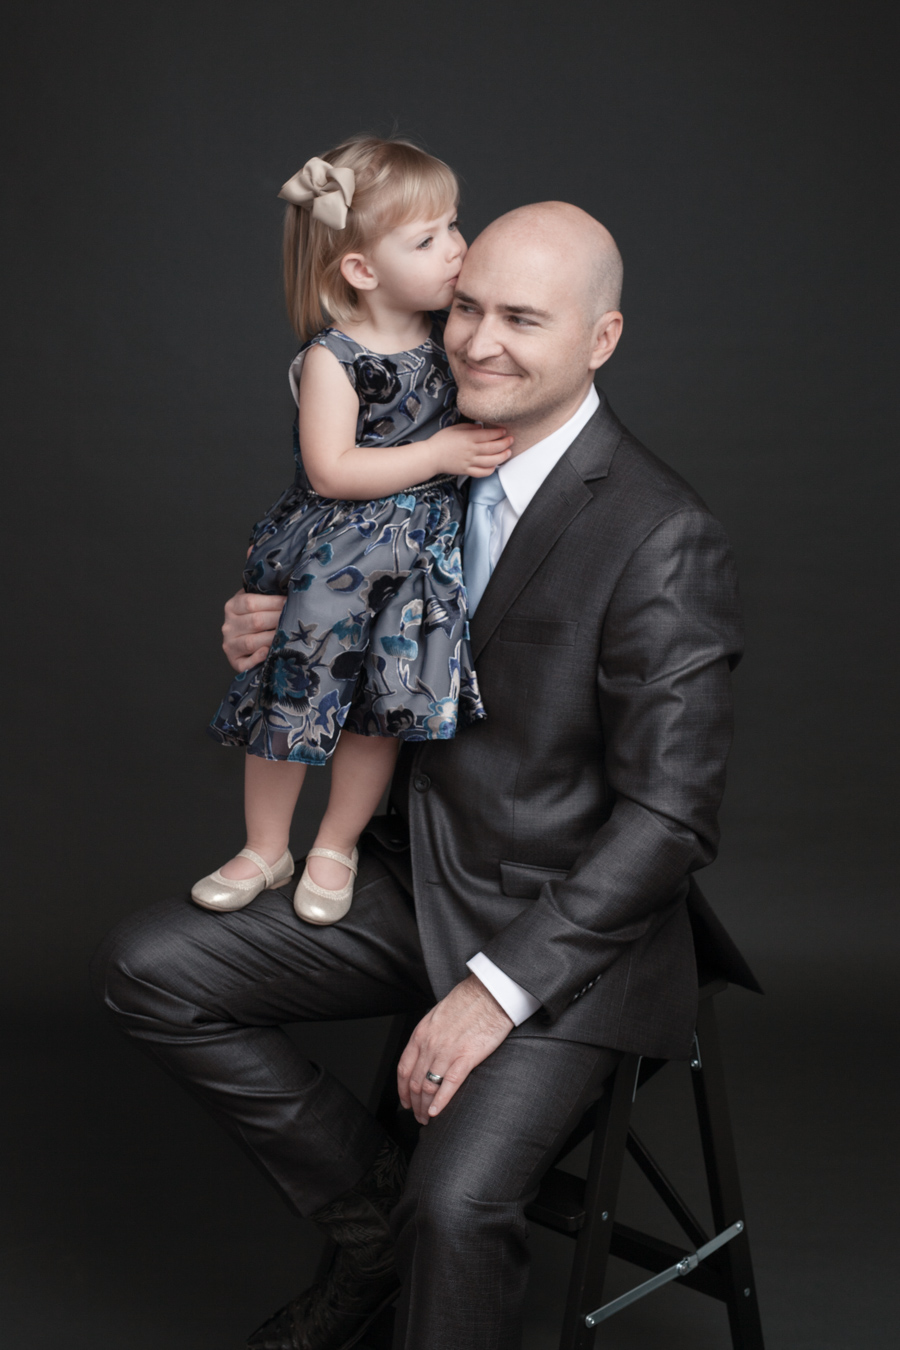 anna_kraft_photography_georgetown_square_studio_family_portrait_austin_photo-1.jpg